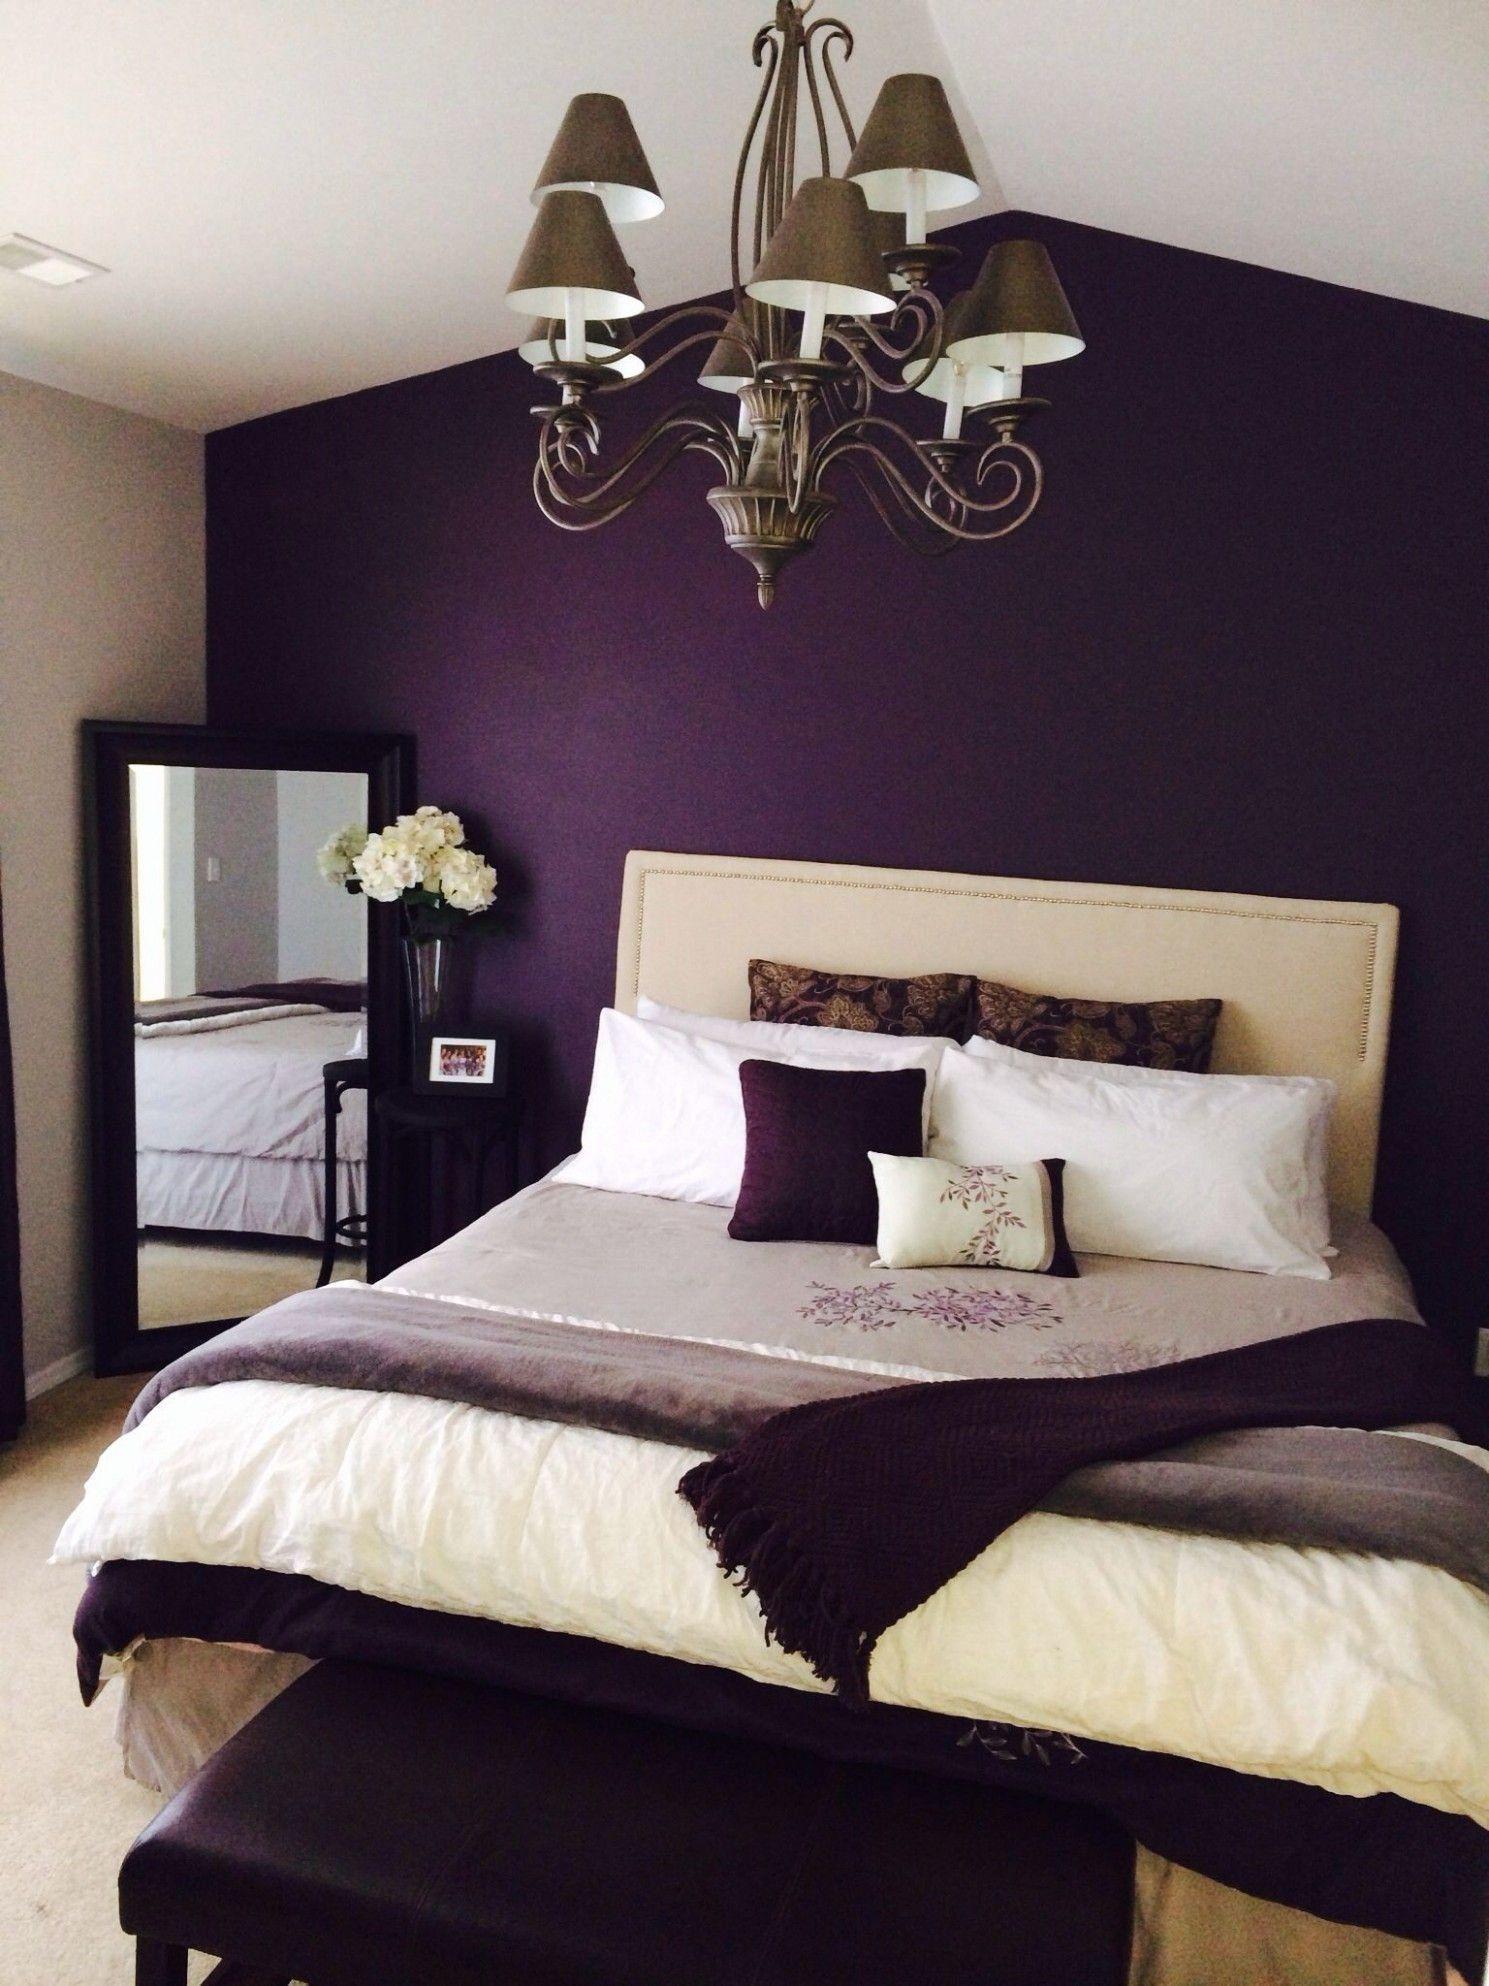 Romantic Purple Master Bedroom Ideas Romantic Purple Master Bedroom Ideas Wenime 1000 In 2020 Purple Master Bedroom Purple Bedroom Design Purple Bedroom Decor